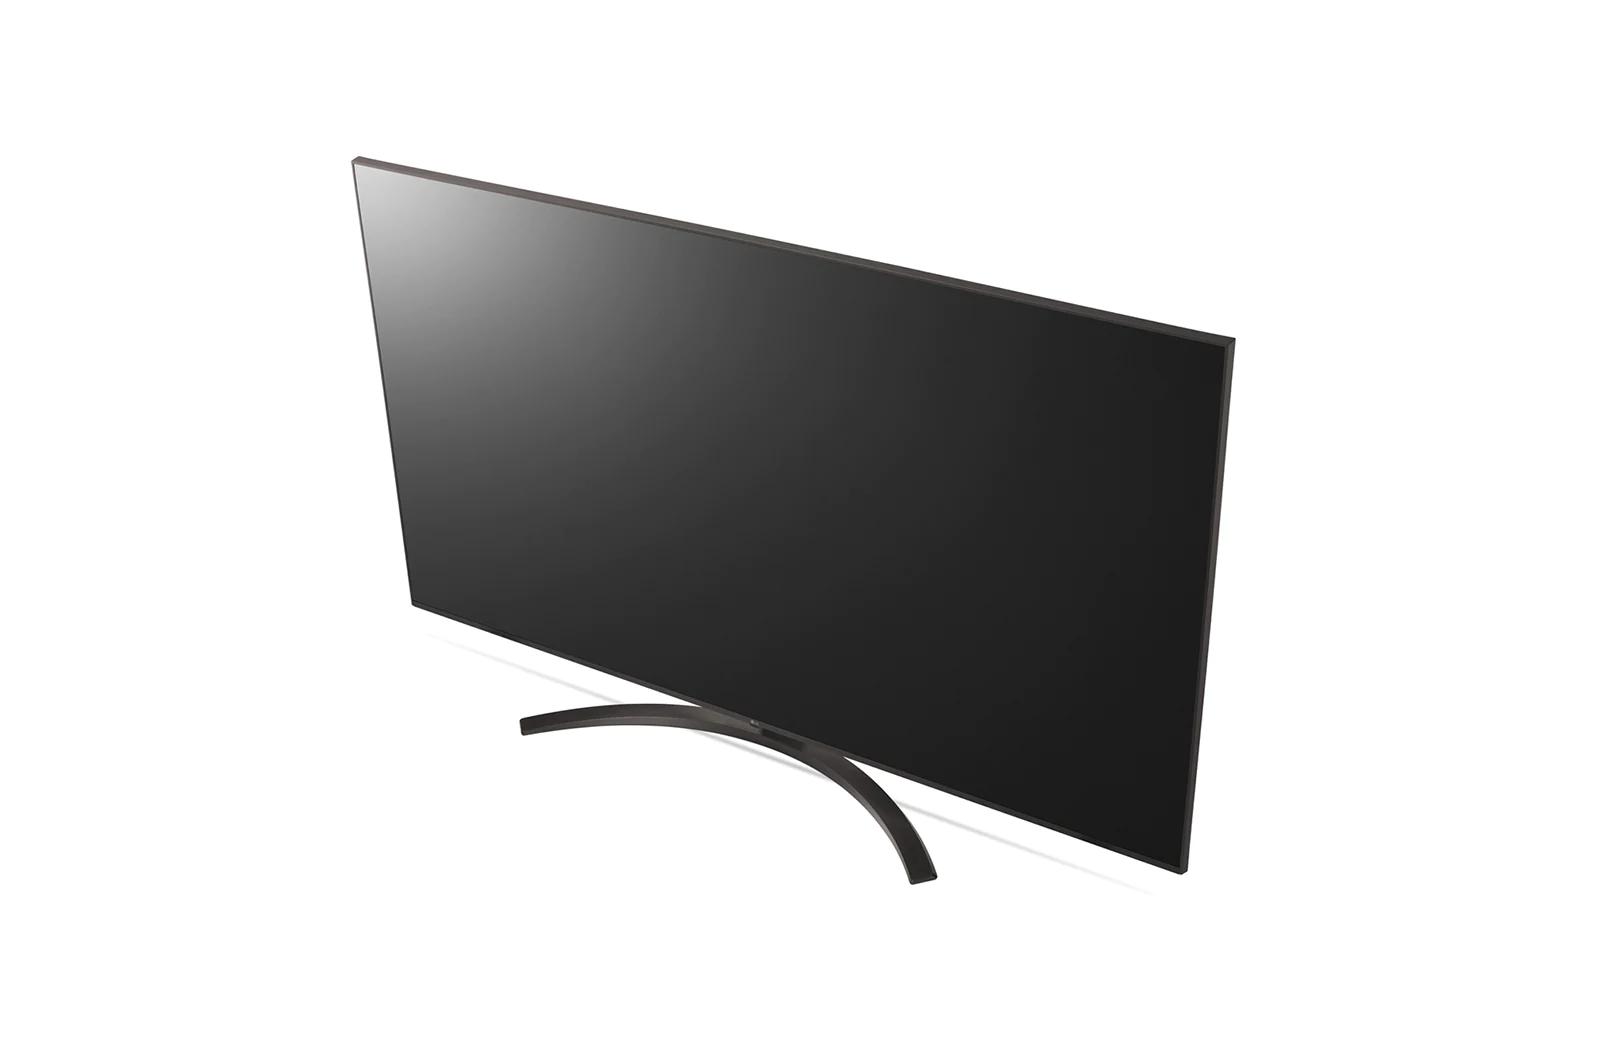 Televizor LG LED 50UP78006LC  - 5